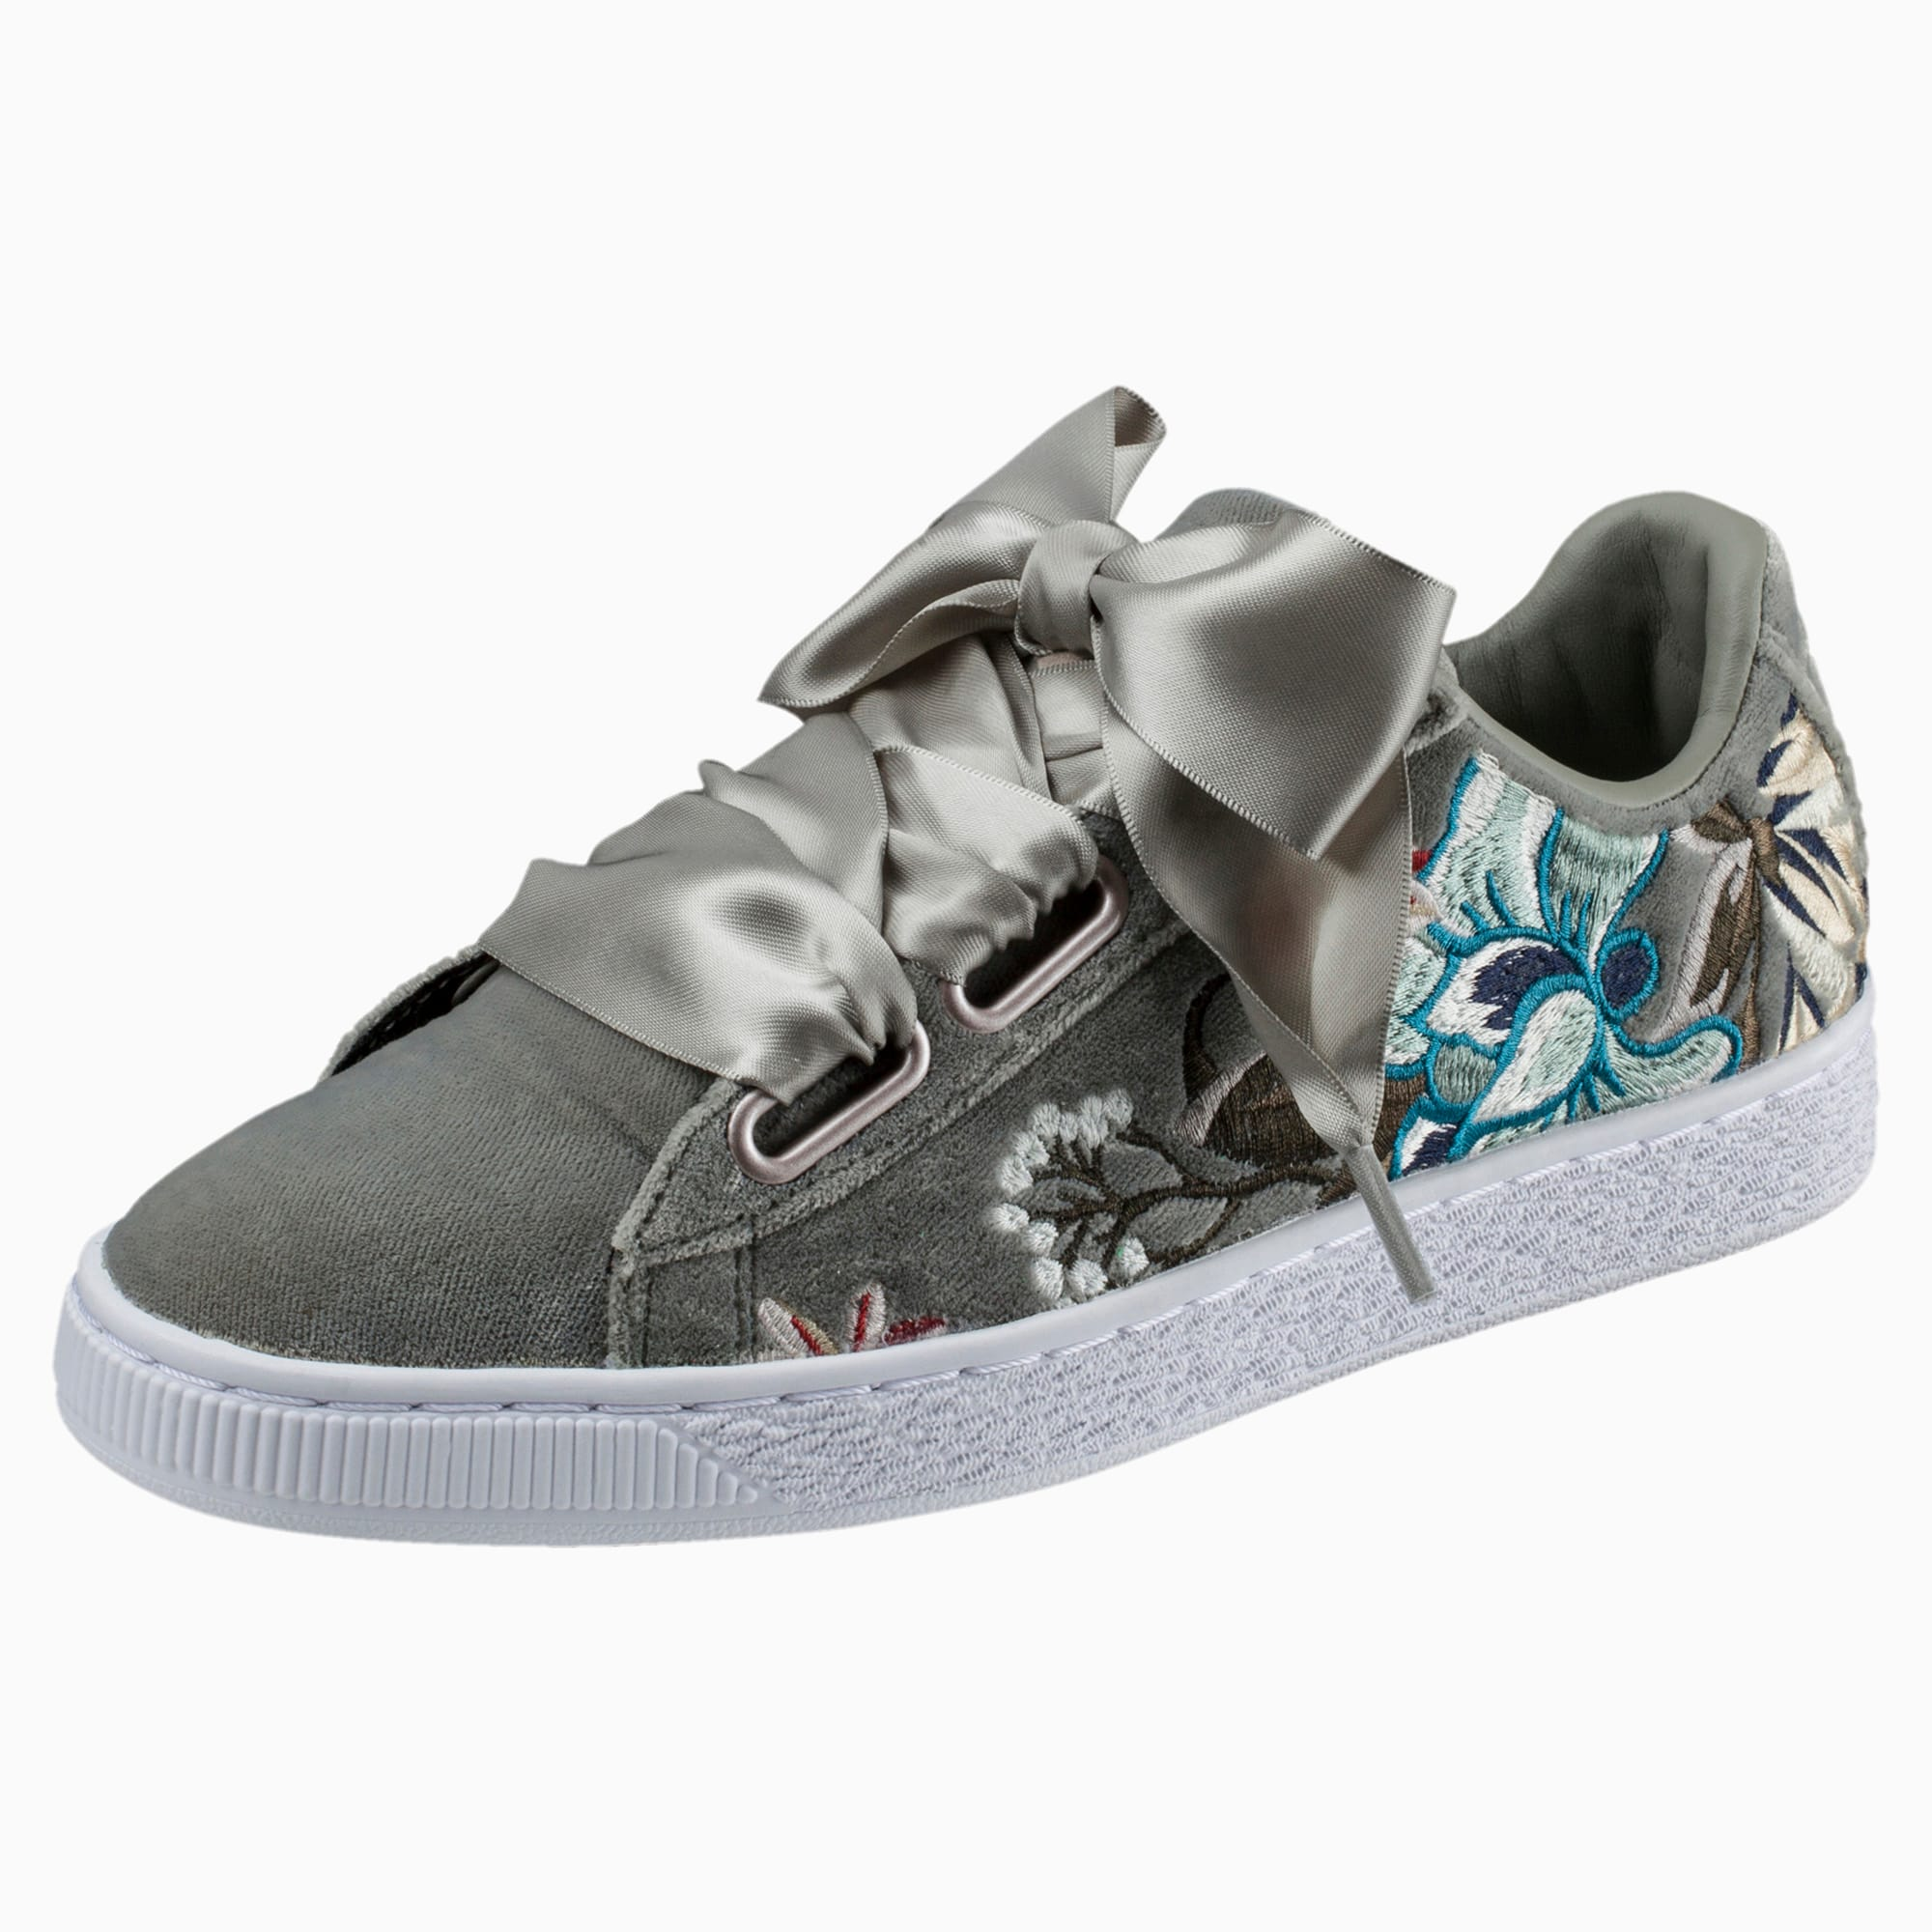 Puma Basket Heart Hyper Embroidered Sneaker | Puma basket